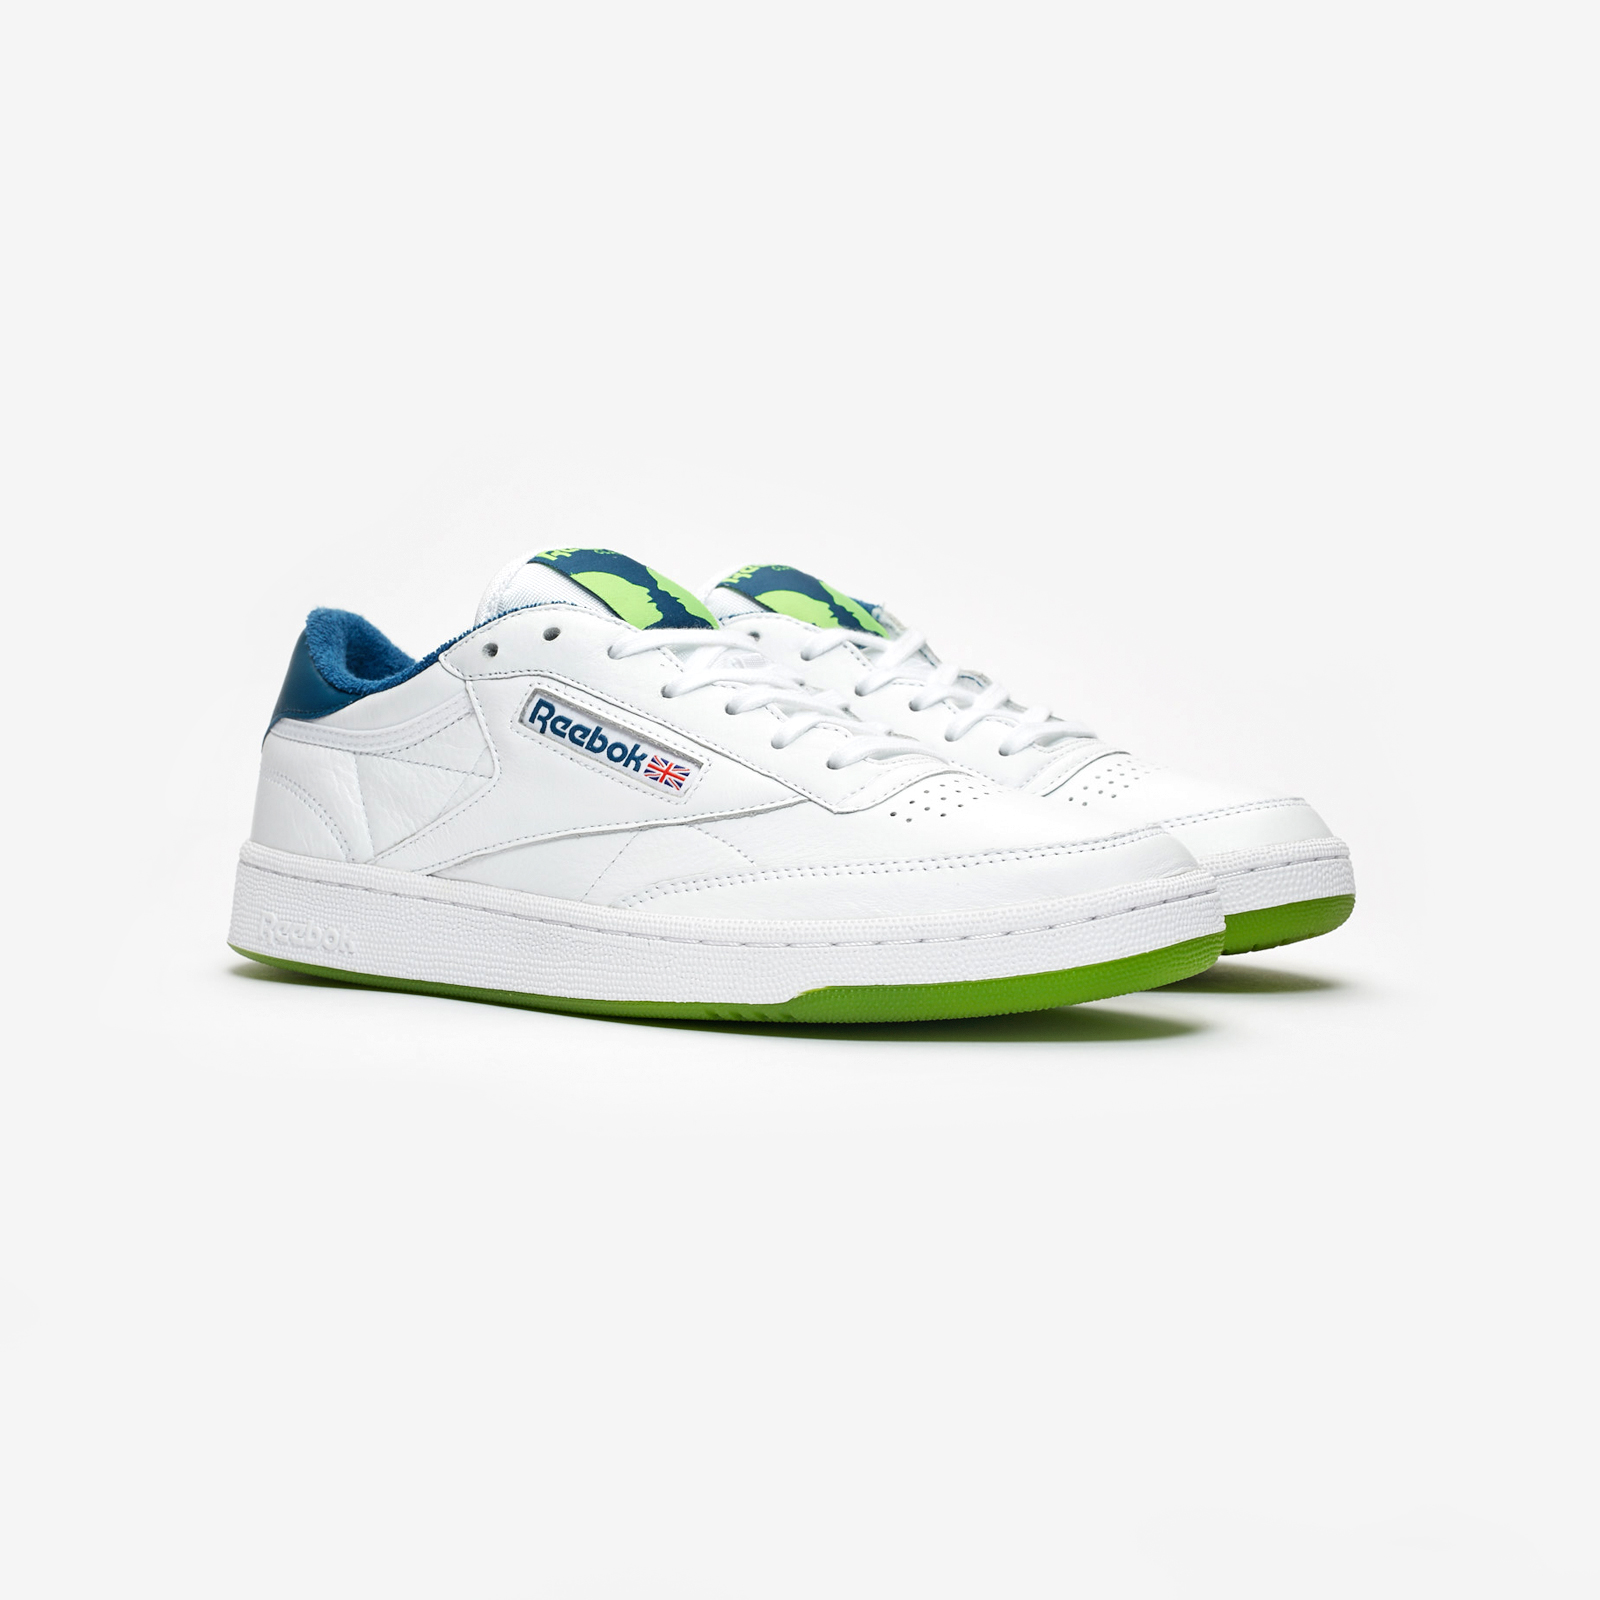 dcfd424816081a Reebok Club C 85 x Bronze - Dv4822 - Sneakersnstuff